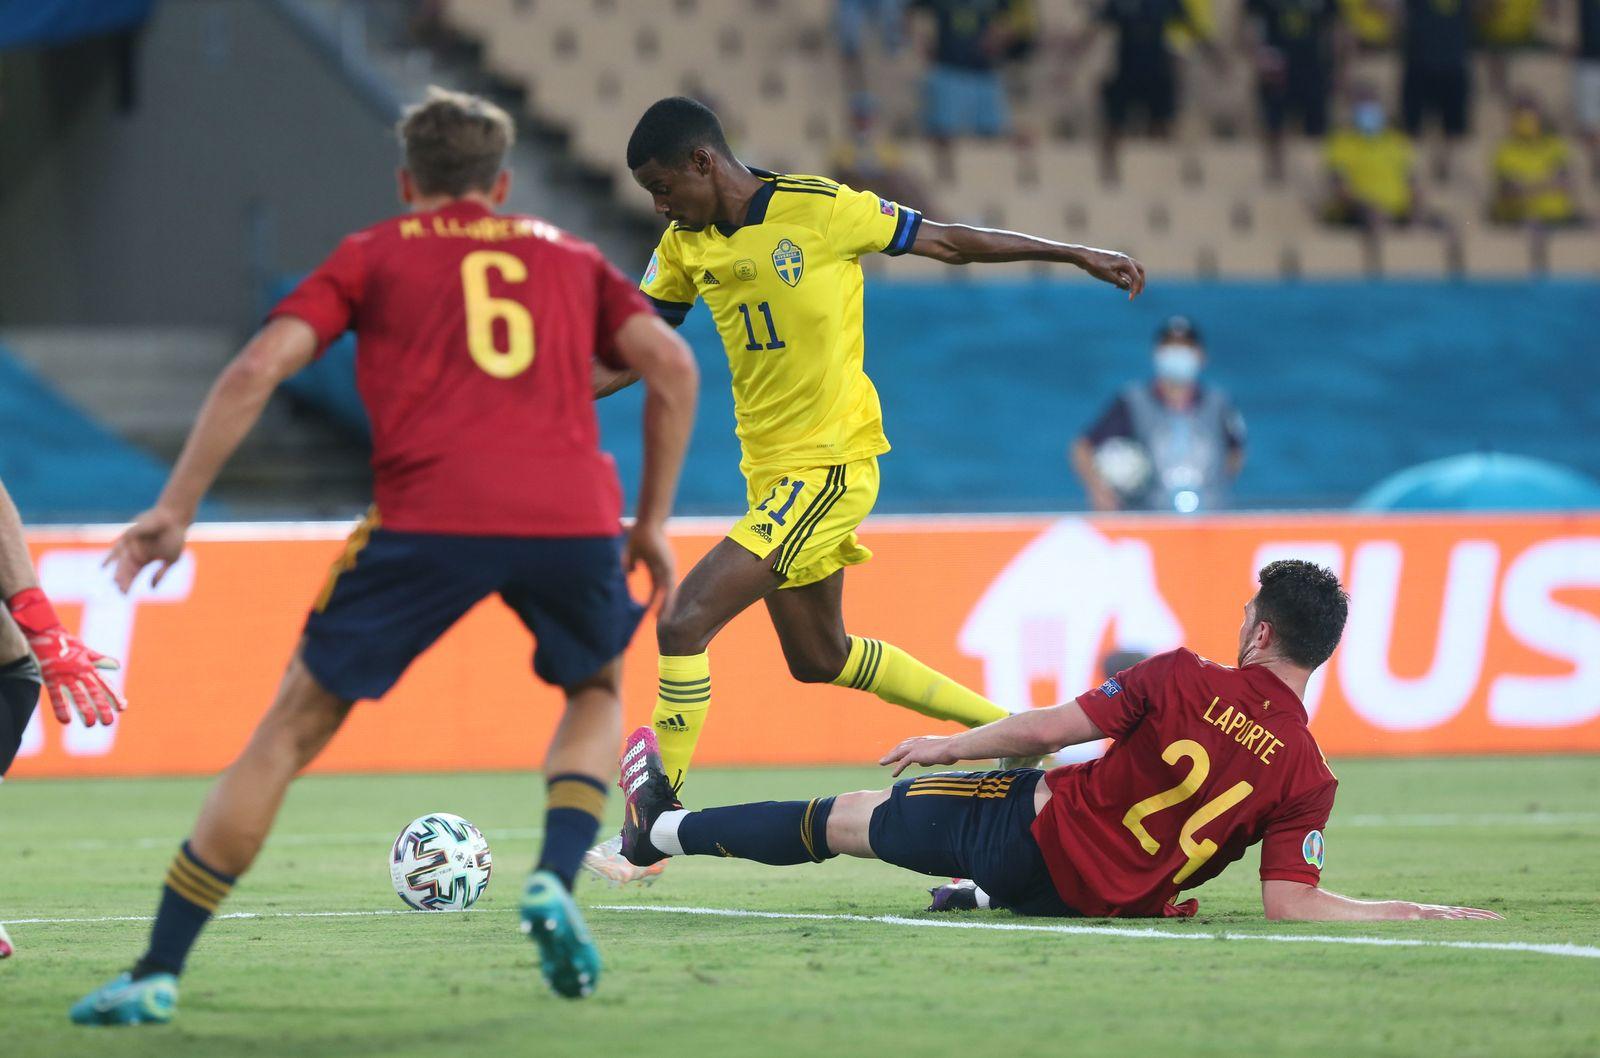 Fußball: EM, Gruppe E, Spanien - Schweden